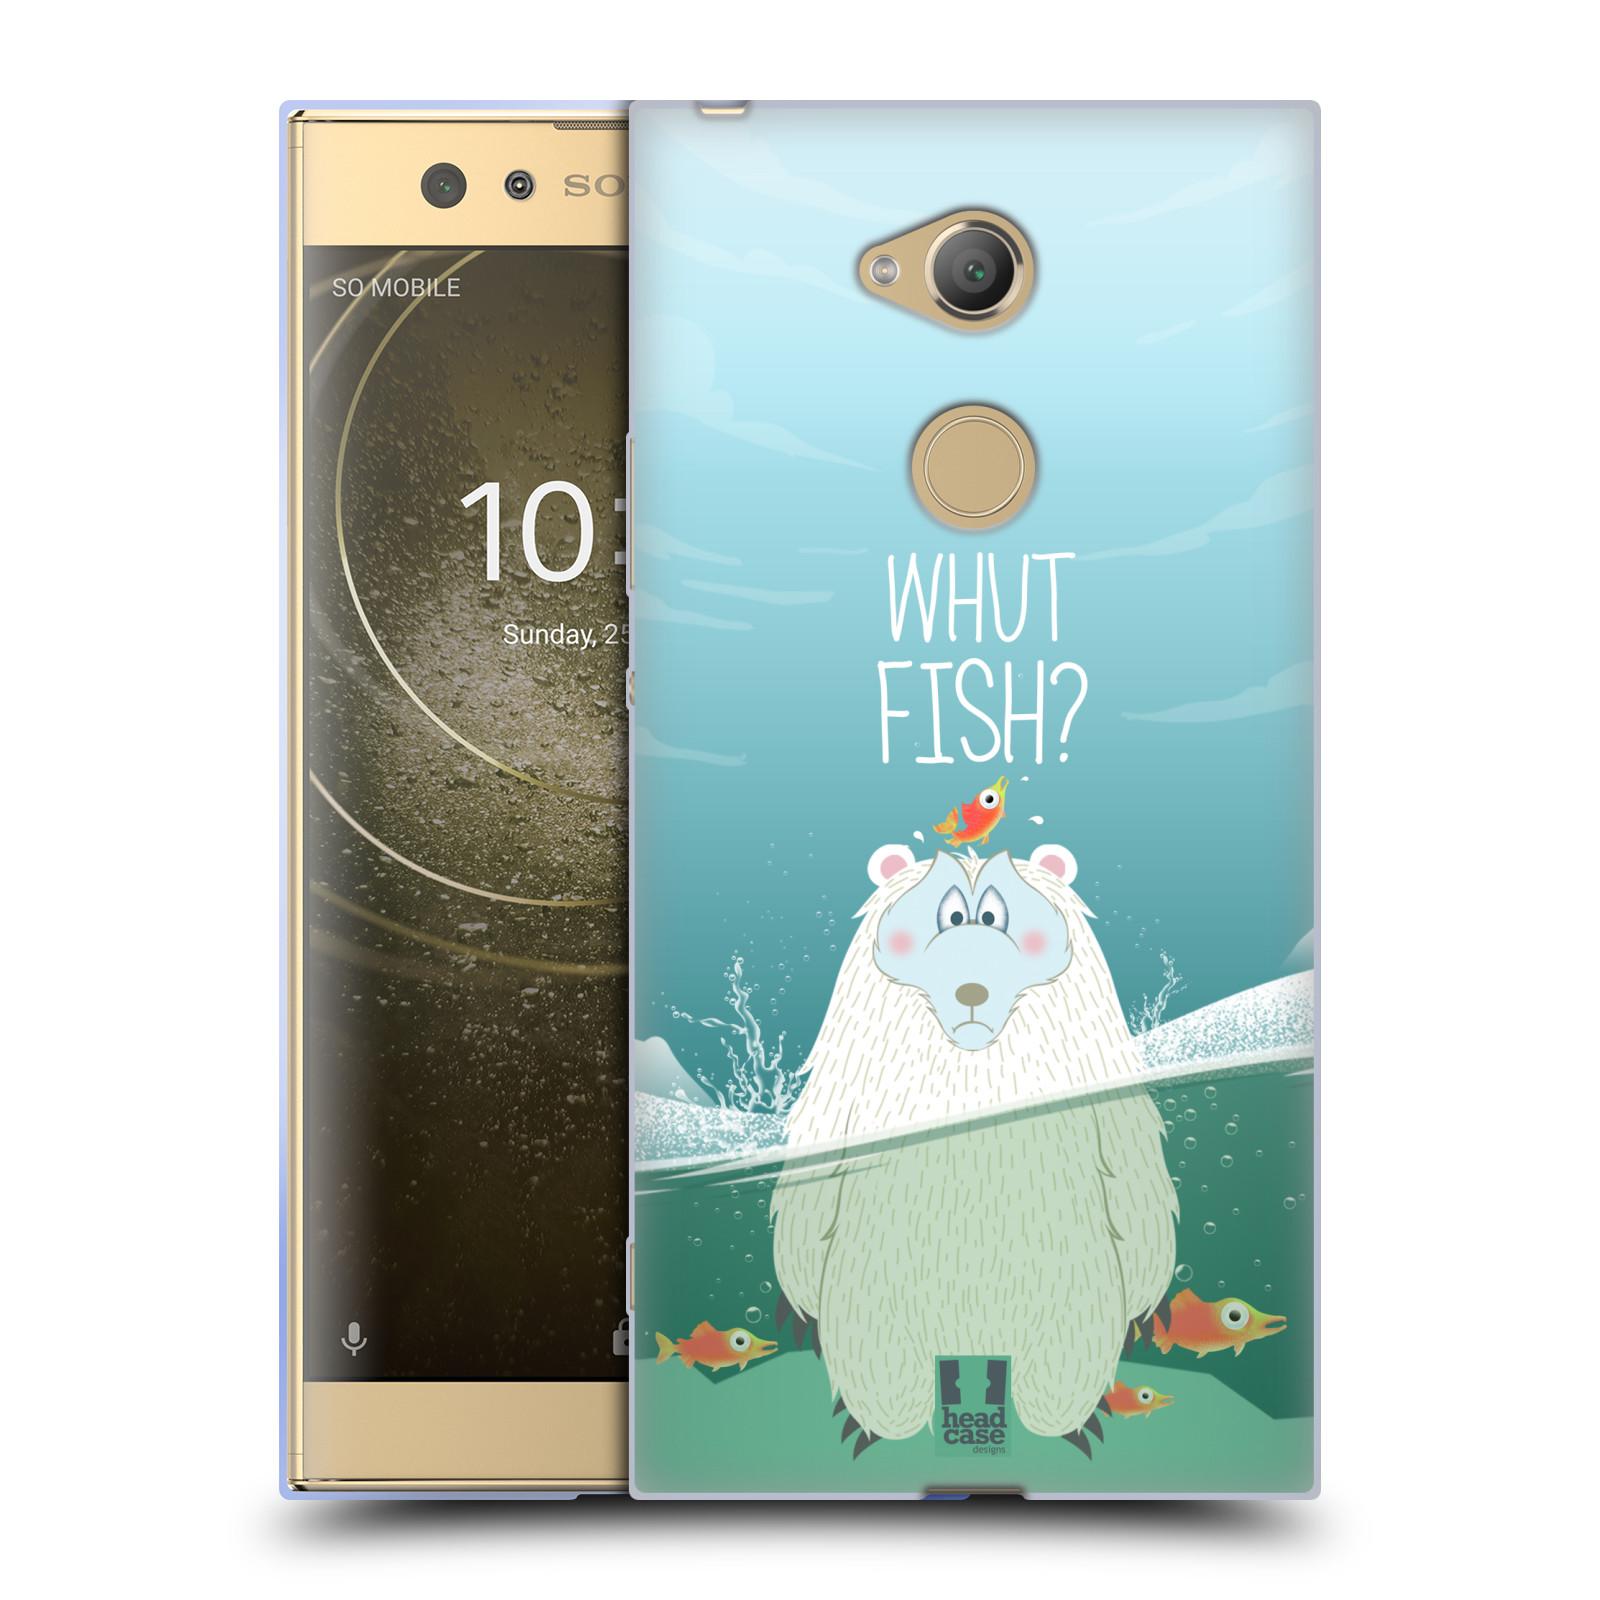 Silikonové pouzdro na mobil Sony Xperia XA2 Ultra - Head Case - Medvěd Whut Fish?